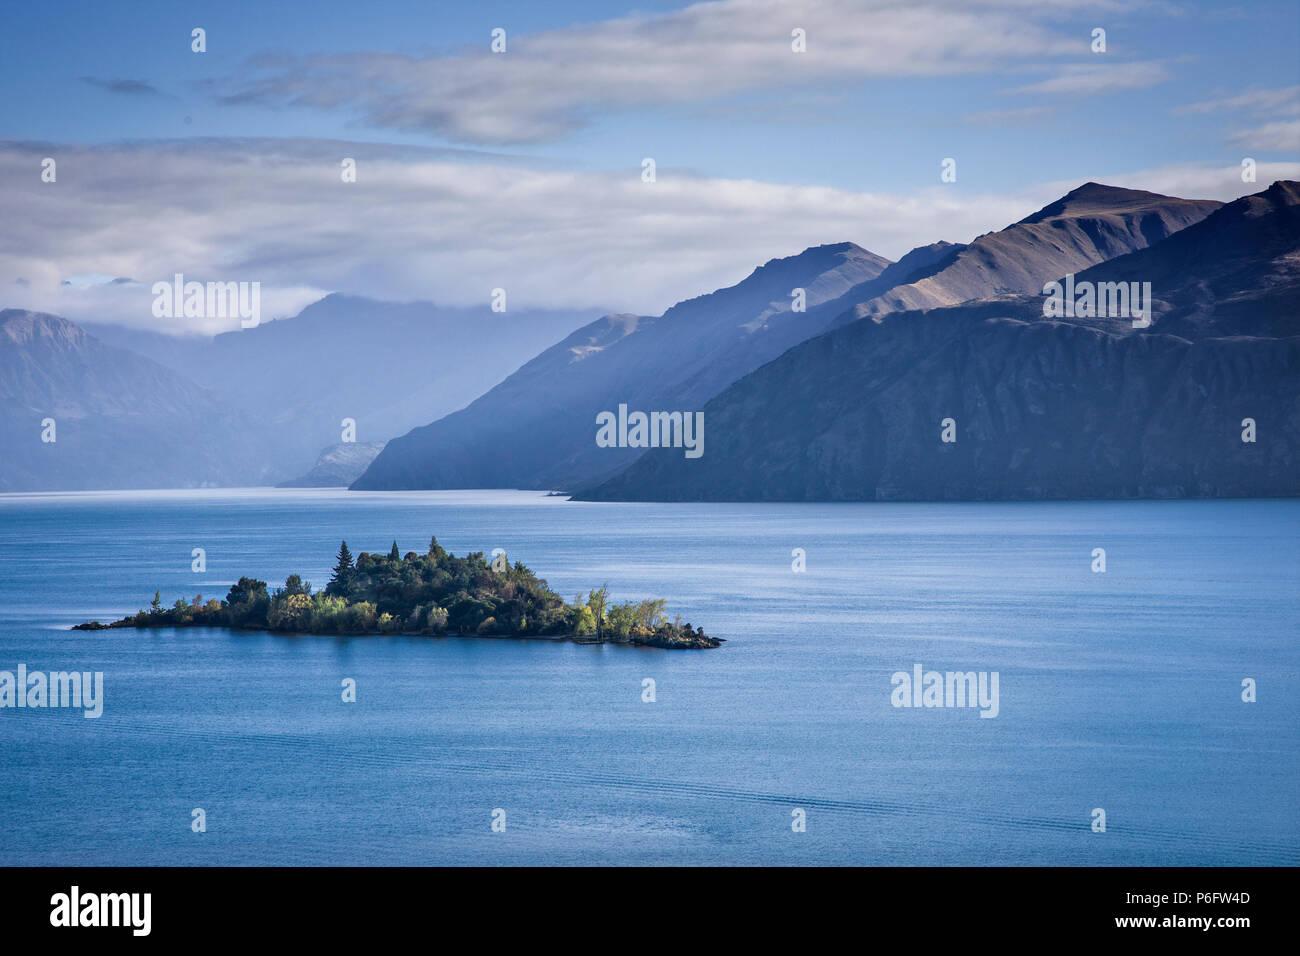 A small island in Lake Wanaka, South Island, New Zealand. - Stock Image